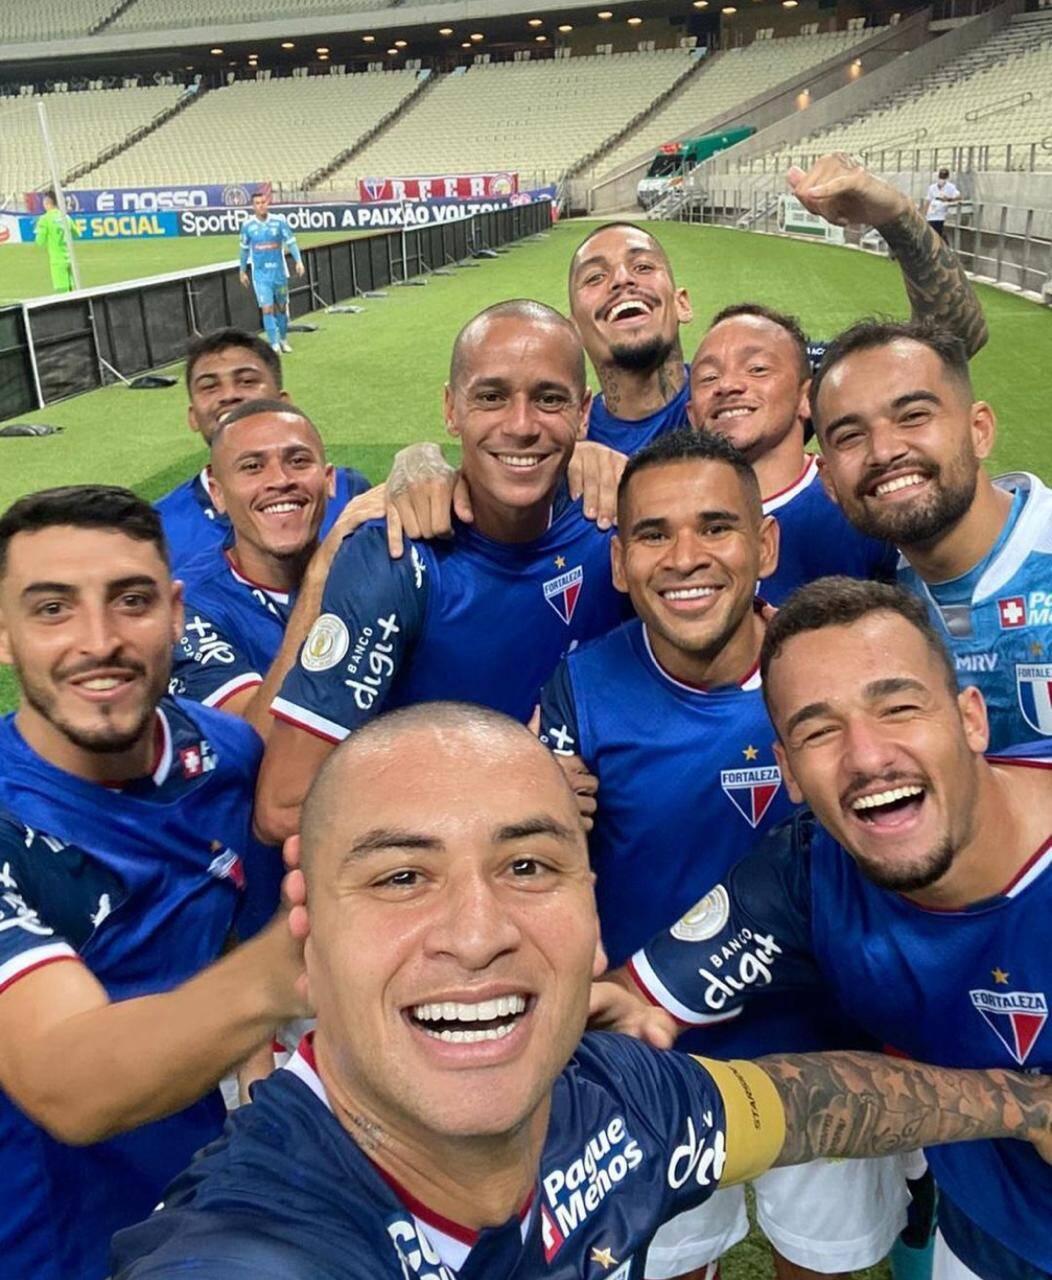 Foto: Instagram/Fortaleza